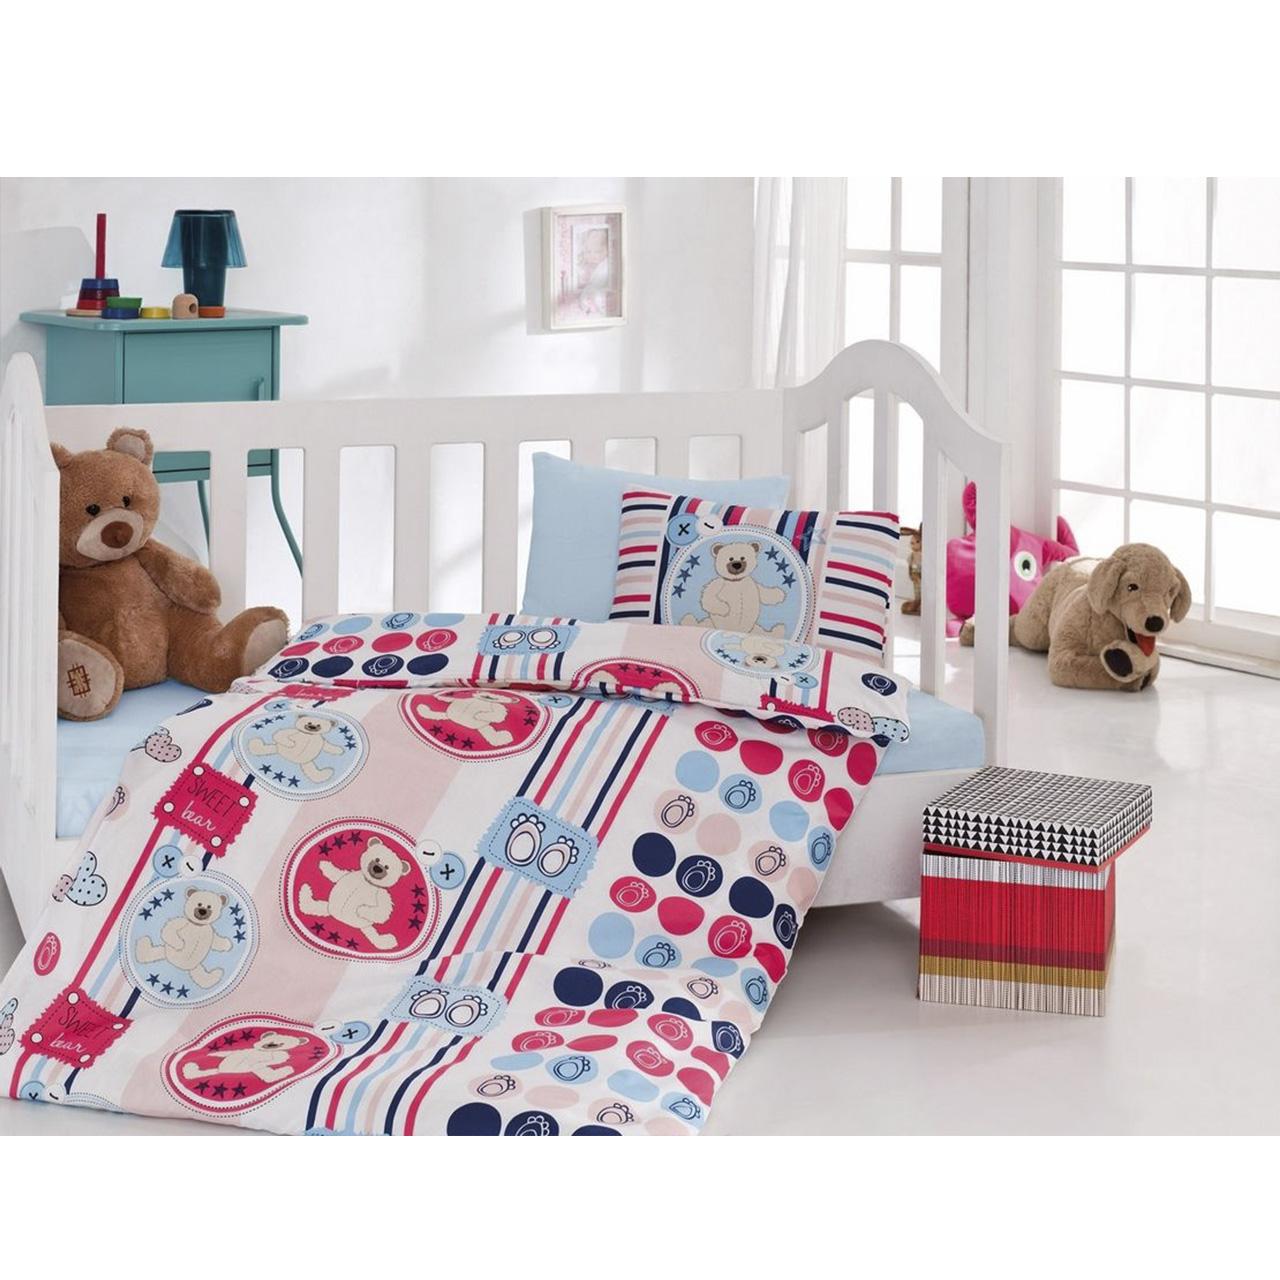 سرویس خواب 4 تکه کودک کاتن باکس  مدل Eyelash Beige | Cotton Box Eyelash Beige Child Bedsheet Set 1 Person 4 Pcs